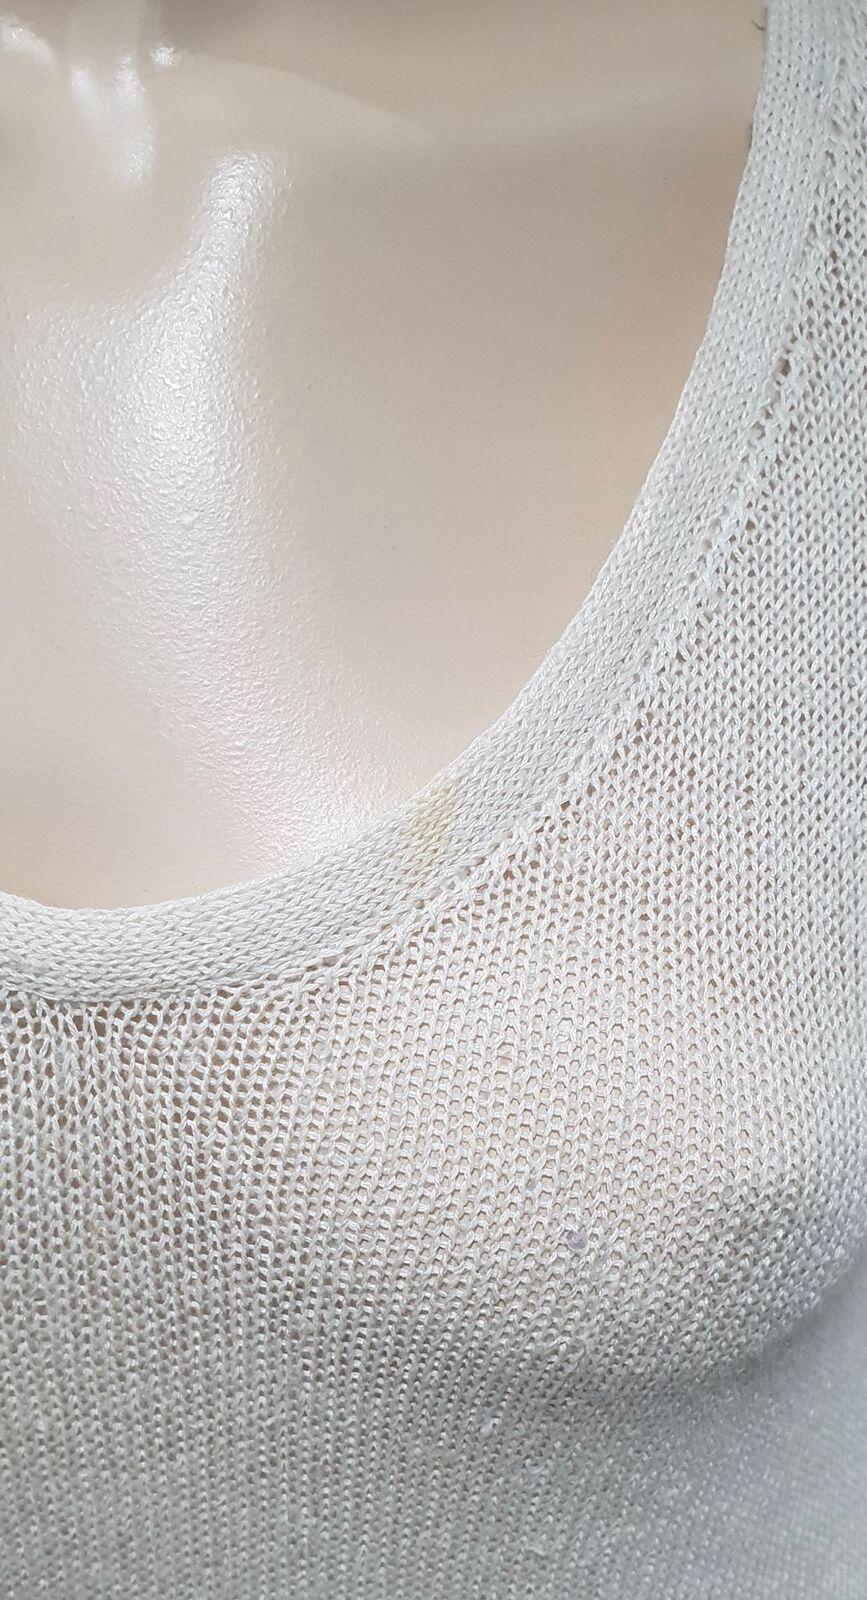 BRUNELLO CUCINELLI Cream Linen & Silk Sequin Sequin Sequin Embellished Jumper Sweater Top M 76145e